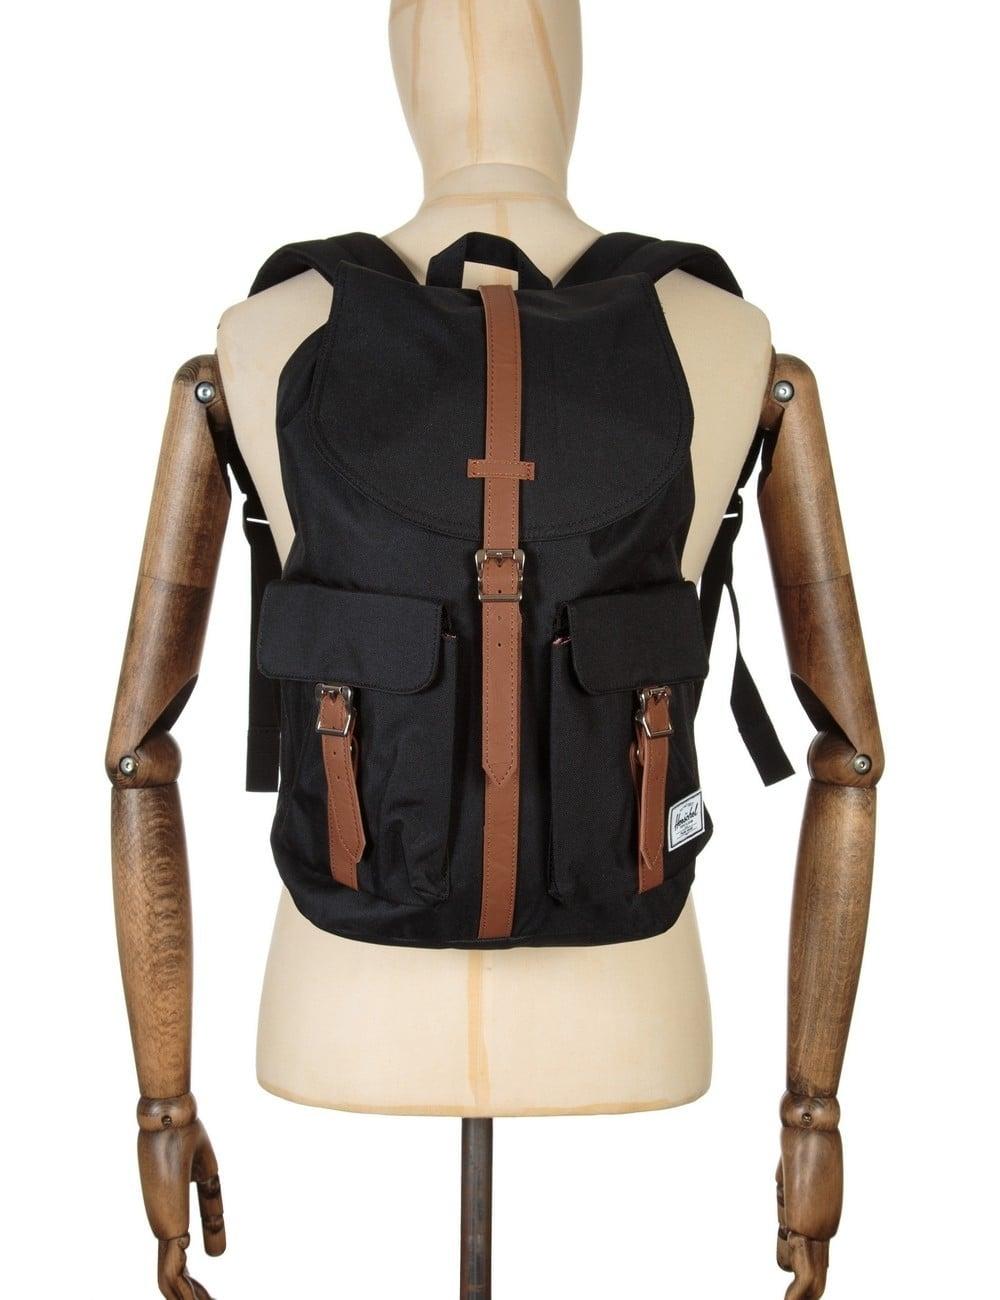 Herschel Supply Co Dawson 20.5L Backpack - Black Tan - Accessories ... bd63834e27745